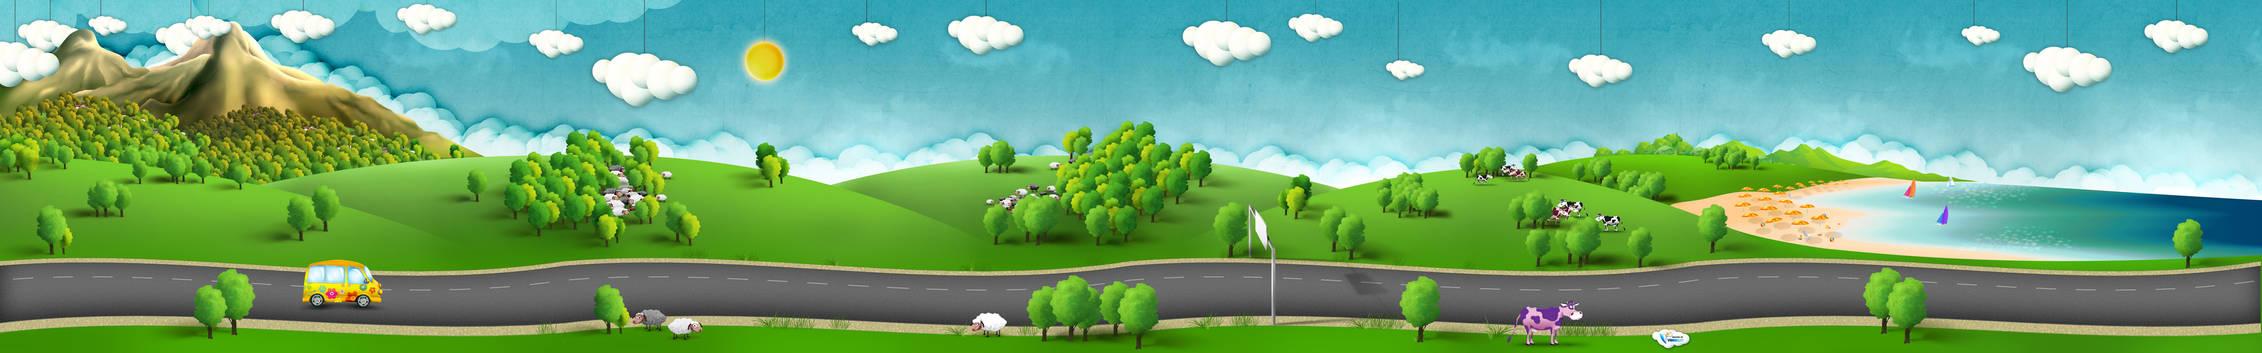 Travelling services web design